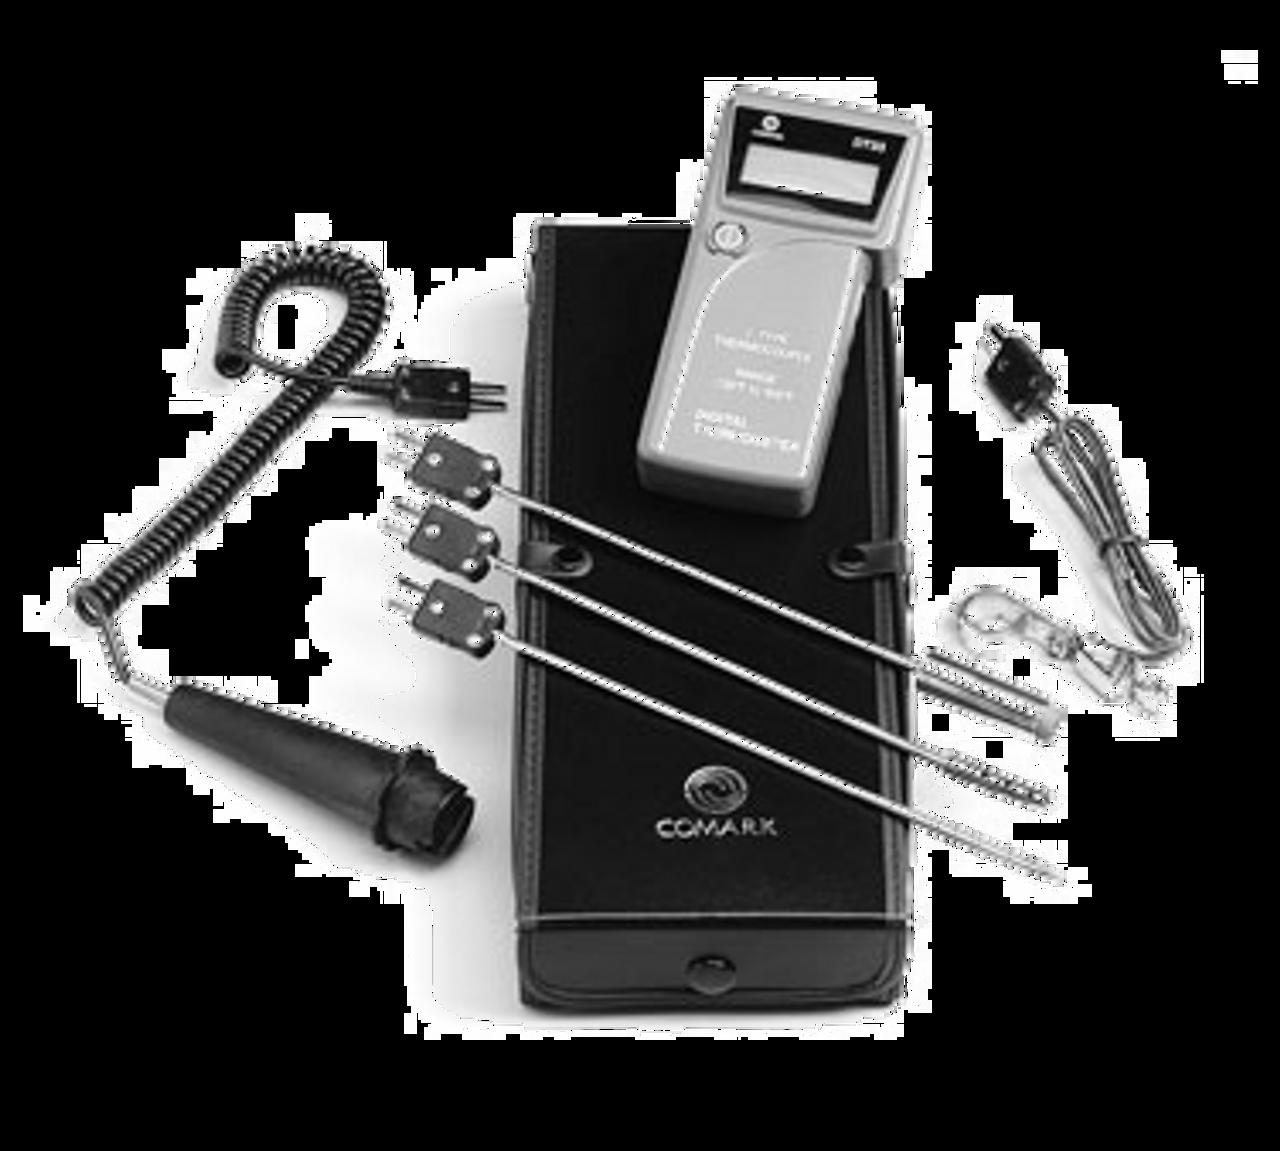 Combination Probe Kit, digital, hand-held, type J, temperature range -125 to 500°F, interchangeable probes, water resistant, includes ATT19/39/40/41/42 probes & AC33 case